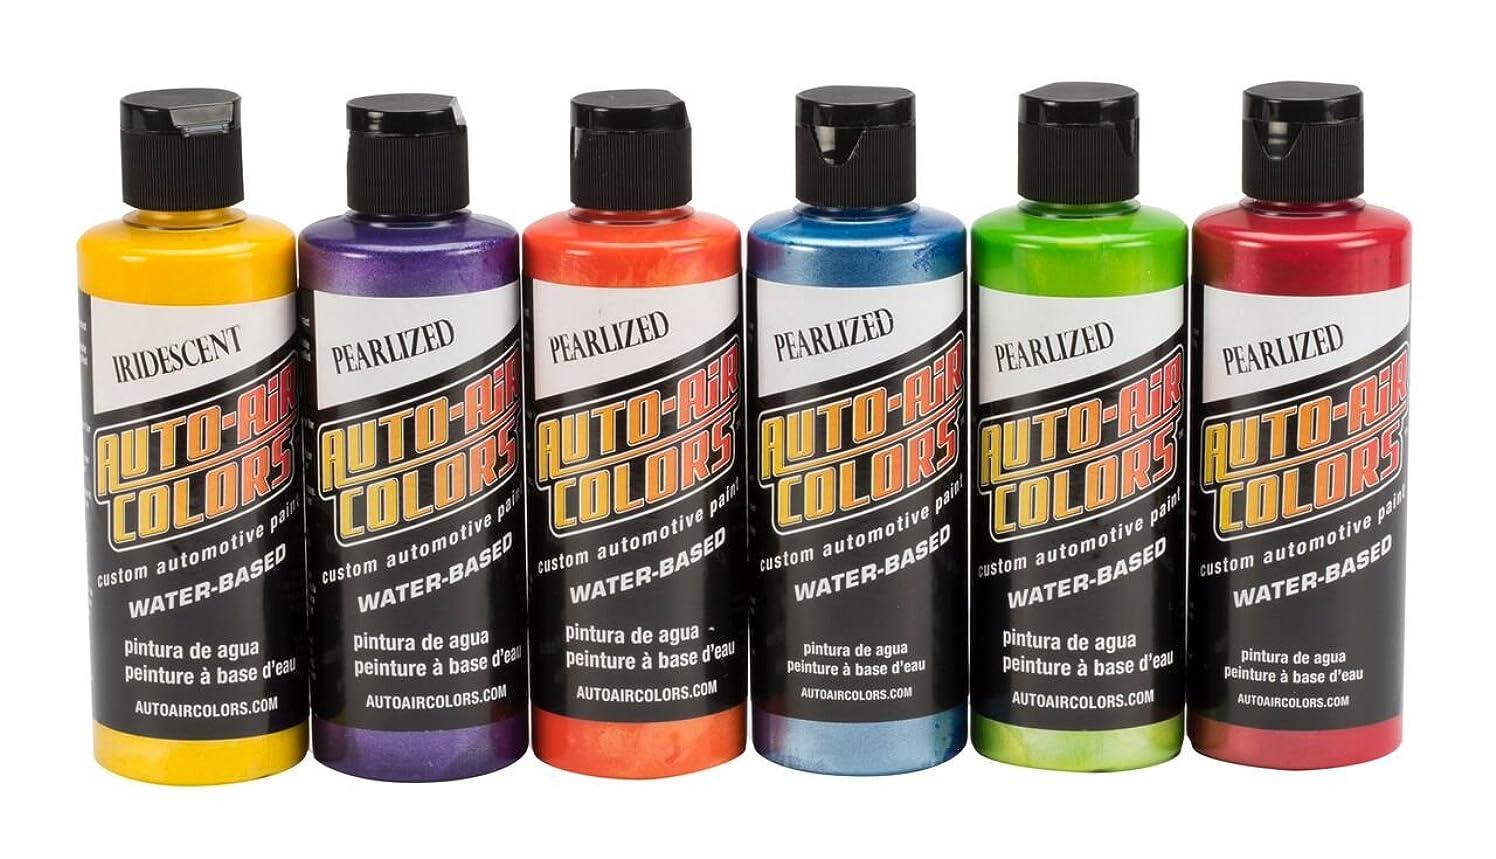 Auto Air Colors 4966-00 Essential Pearlized Colors, 4 oz